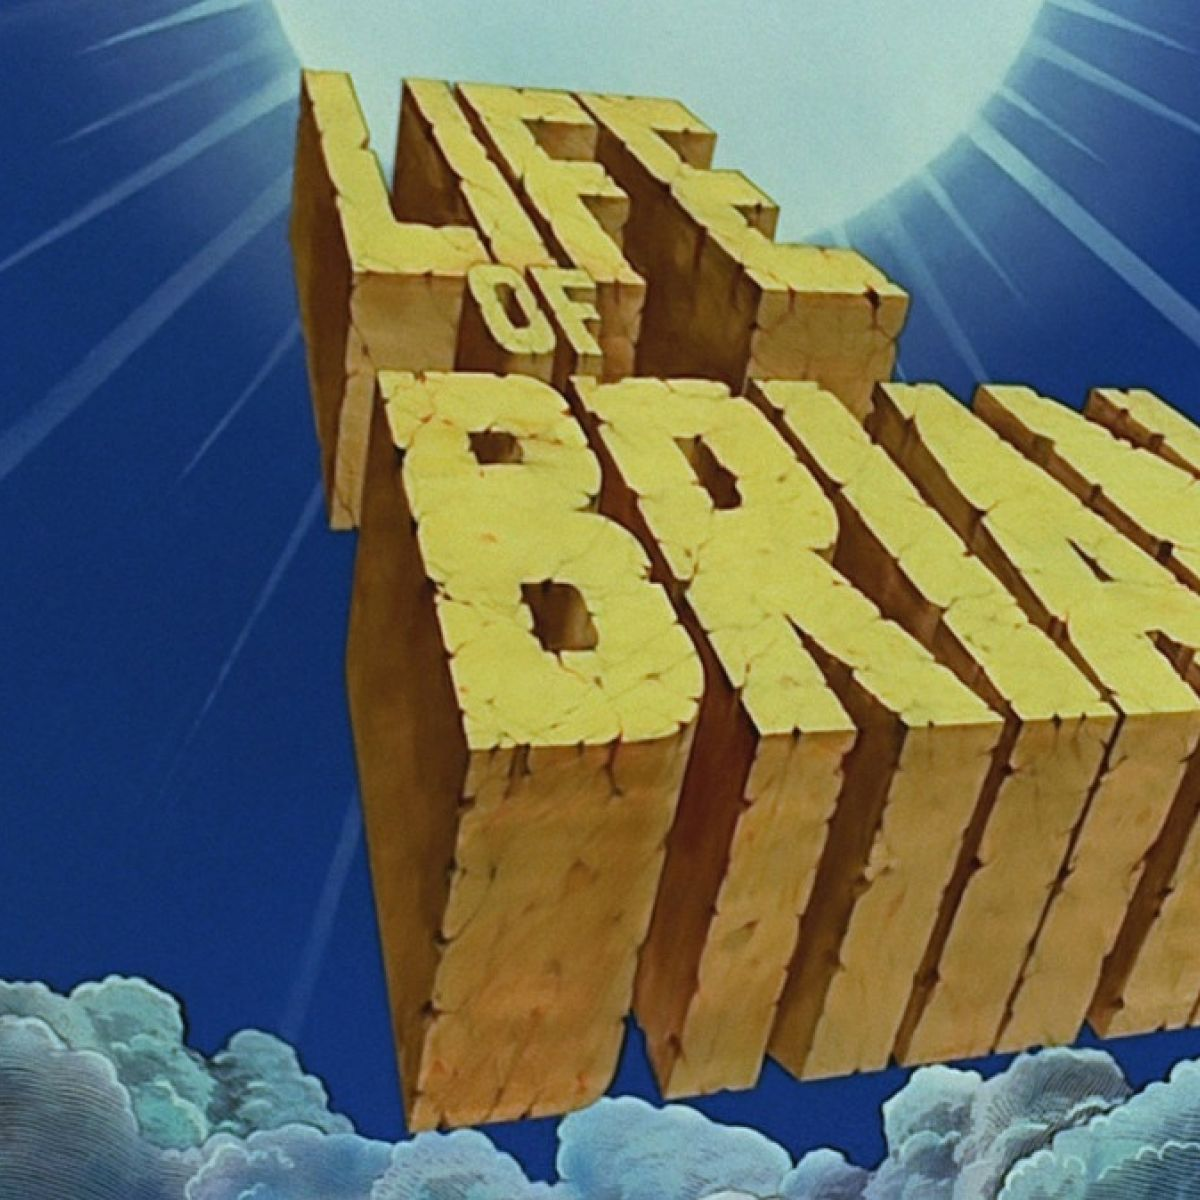 where was life of brian filmed